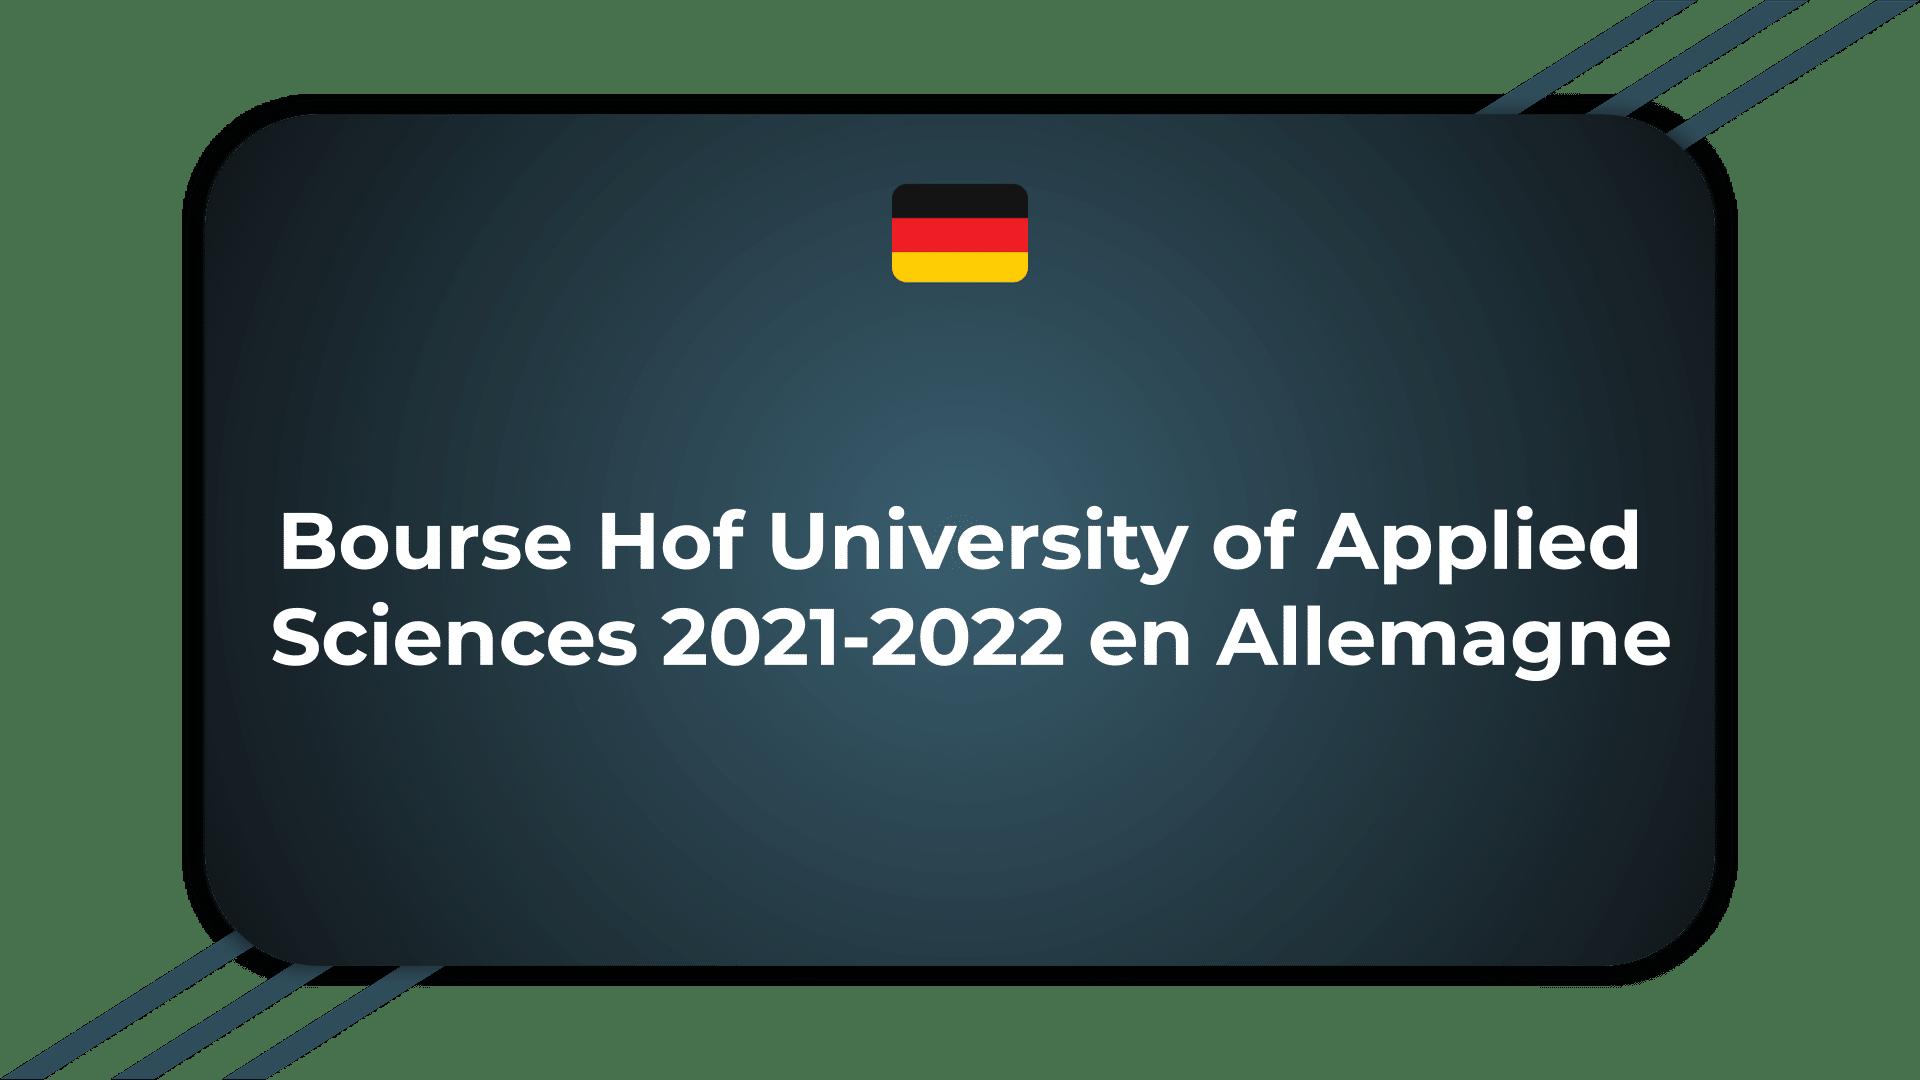 Bourse Hof University of Applied Sciences